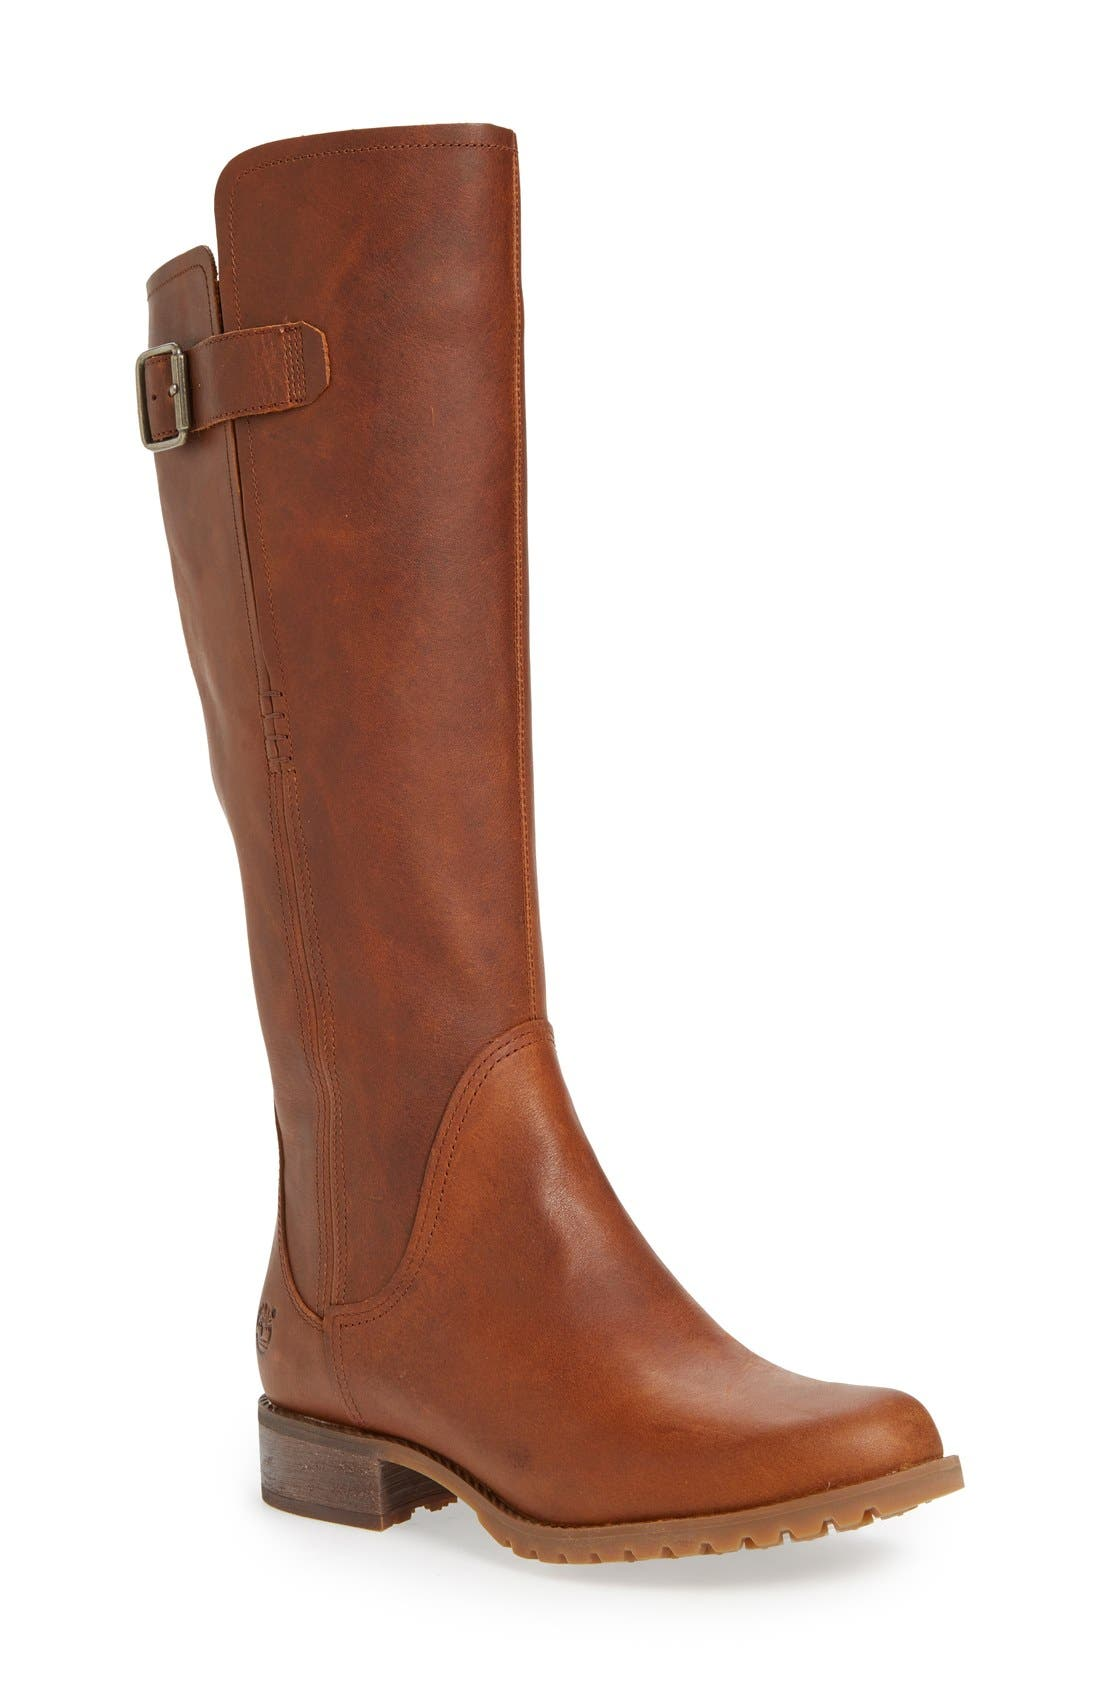 TIMBERLAND Banfield Waterproof Knee High Boot